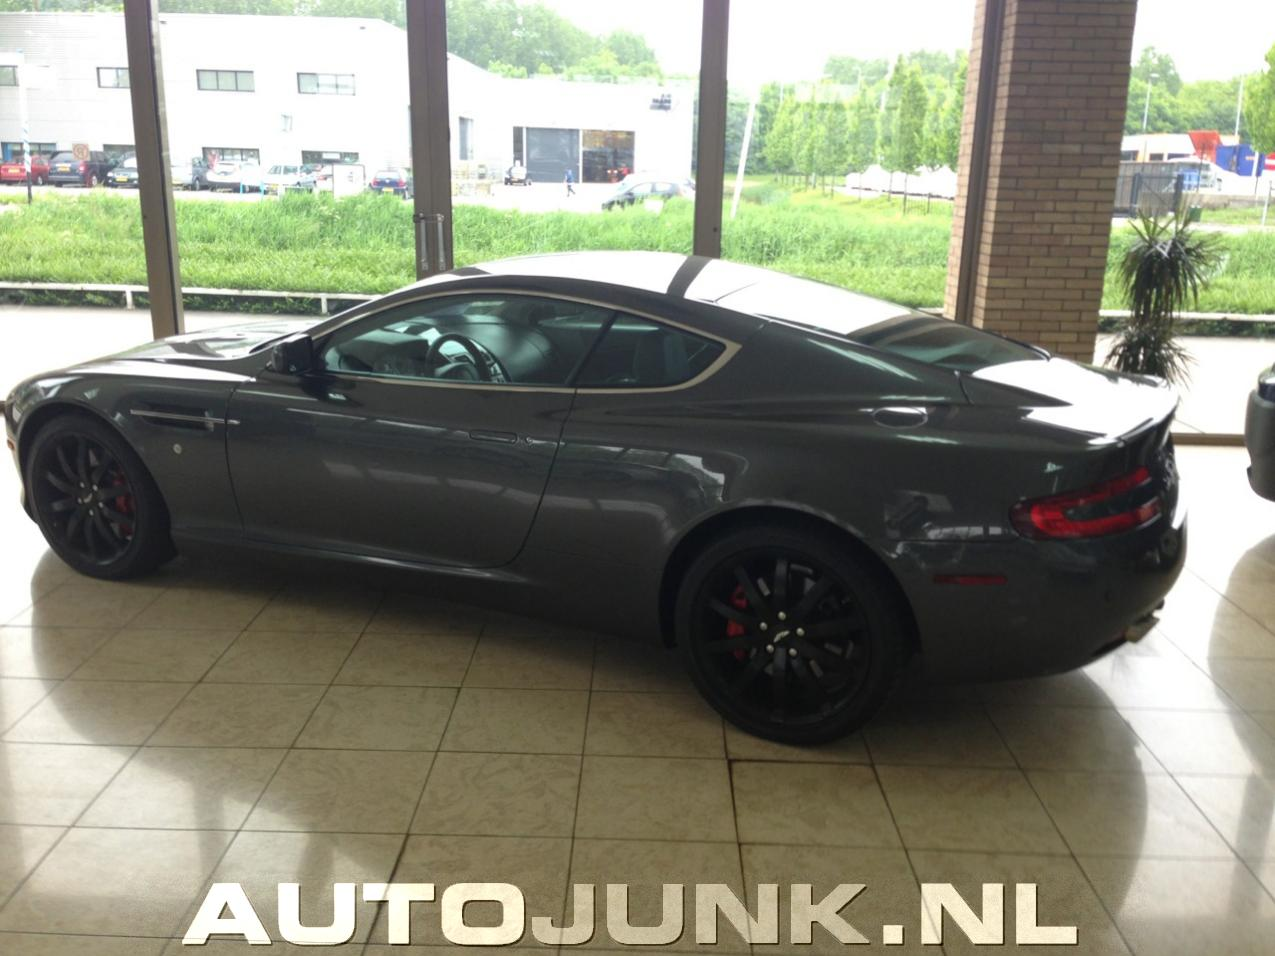 aston martin db9 te koop! foto's » autojunk.nl (96174)